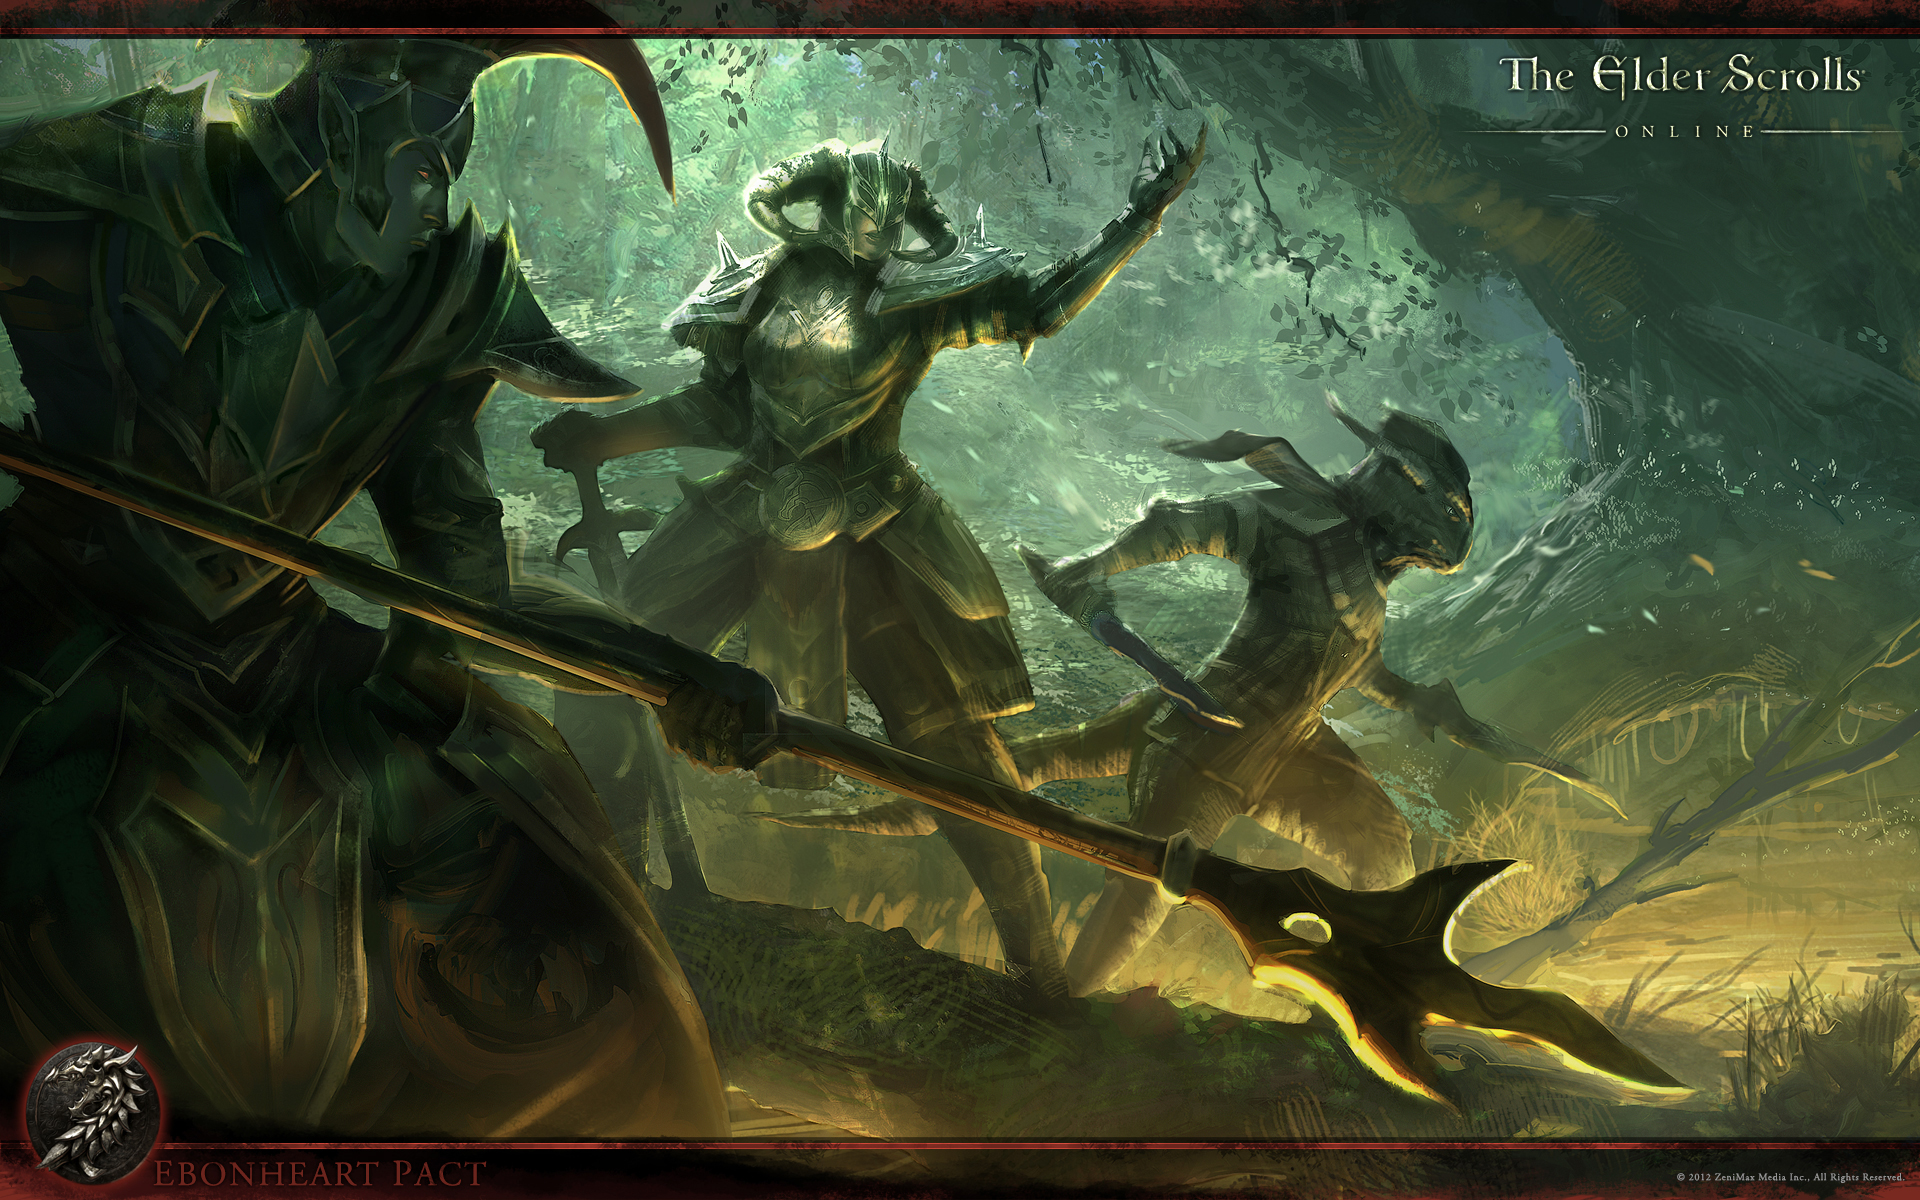 The Elder Scrolls Online Wallpaper Concept Art